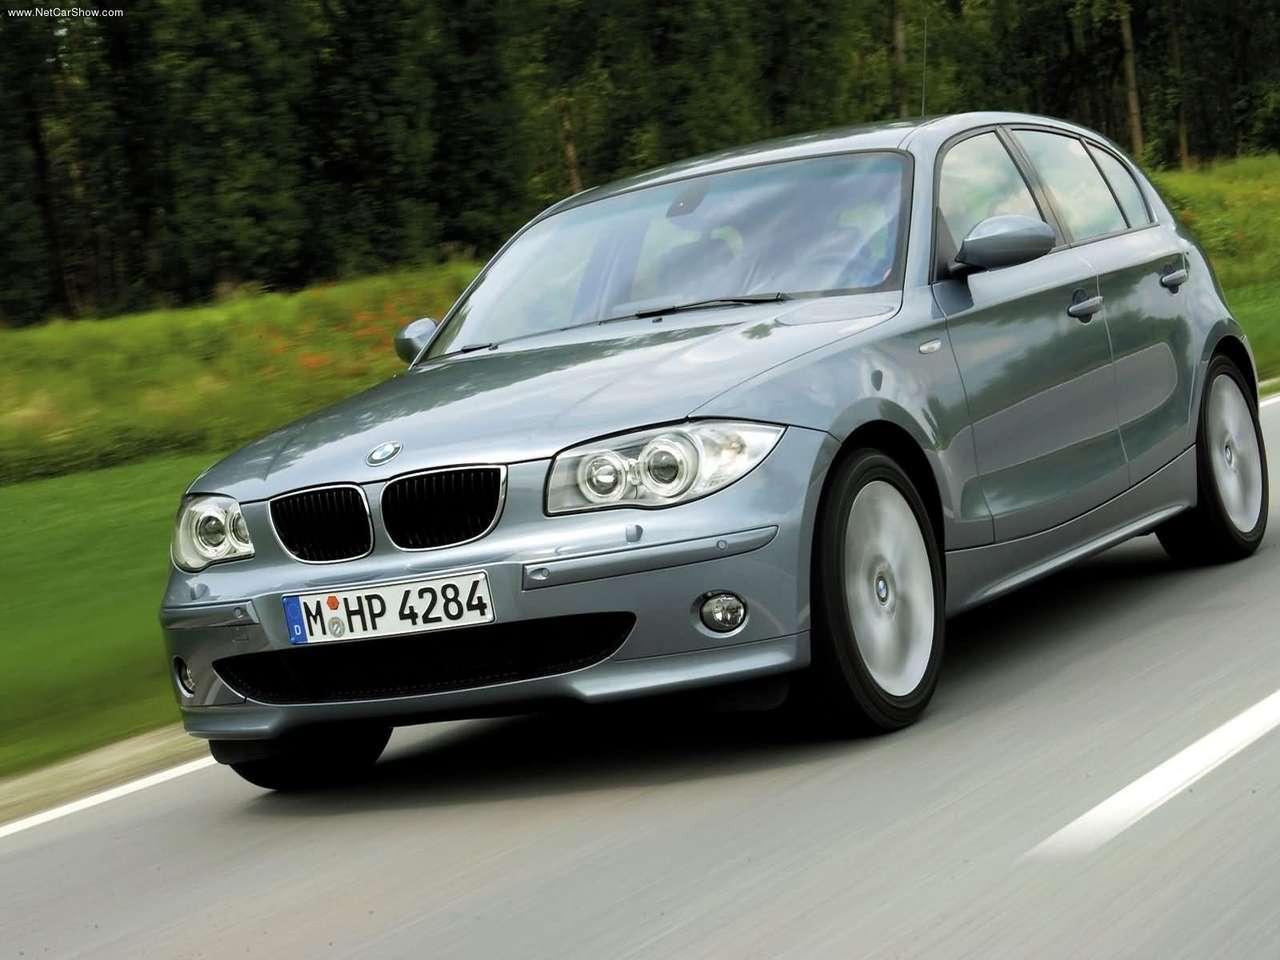 http://3.bp.blogspot.com/_vPMjJG-enrk/TAqOB1aXb_I/AAAAAAAACrM/HwxYWvG_0yc/s1600/BMW-120i_2005_1280x960_wallpaper_05.jpg